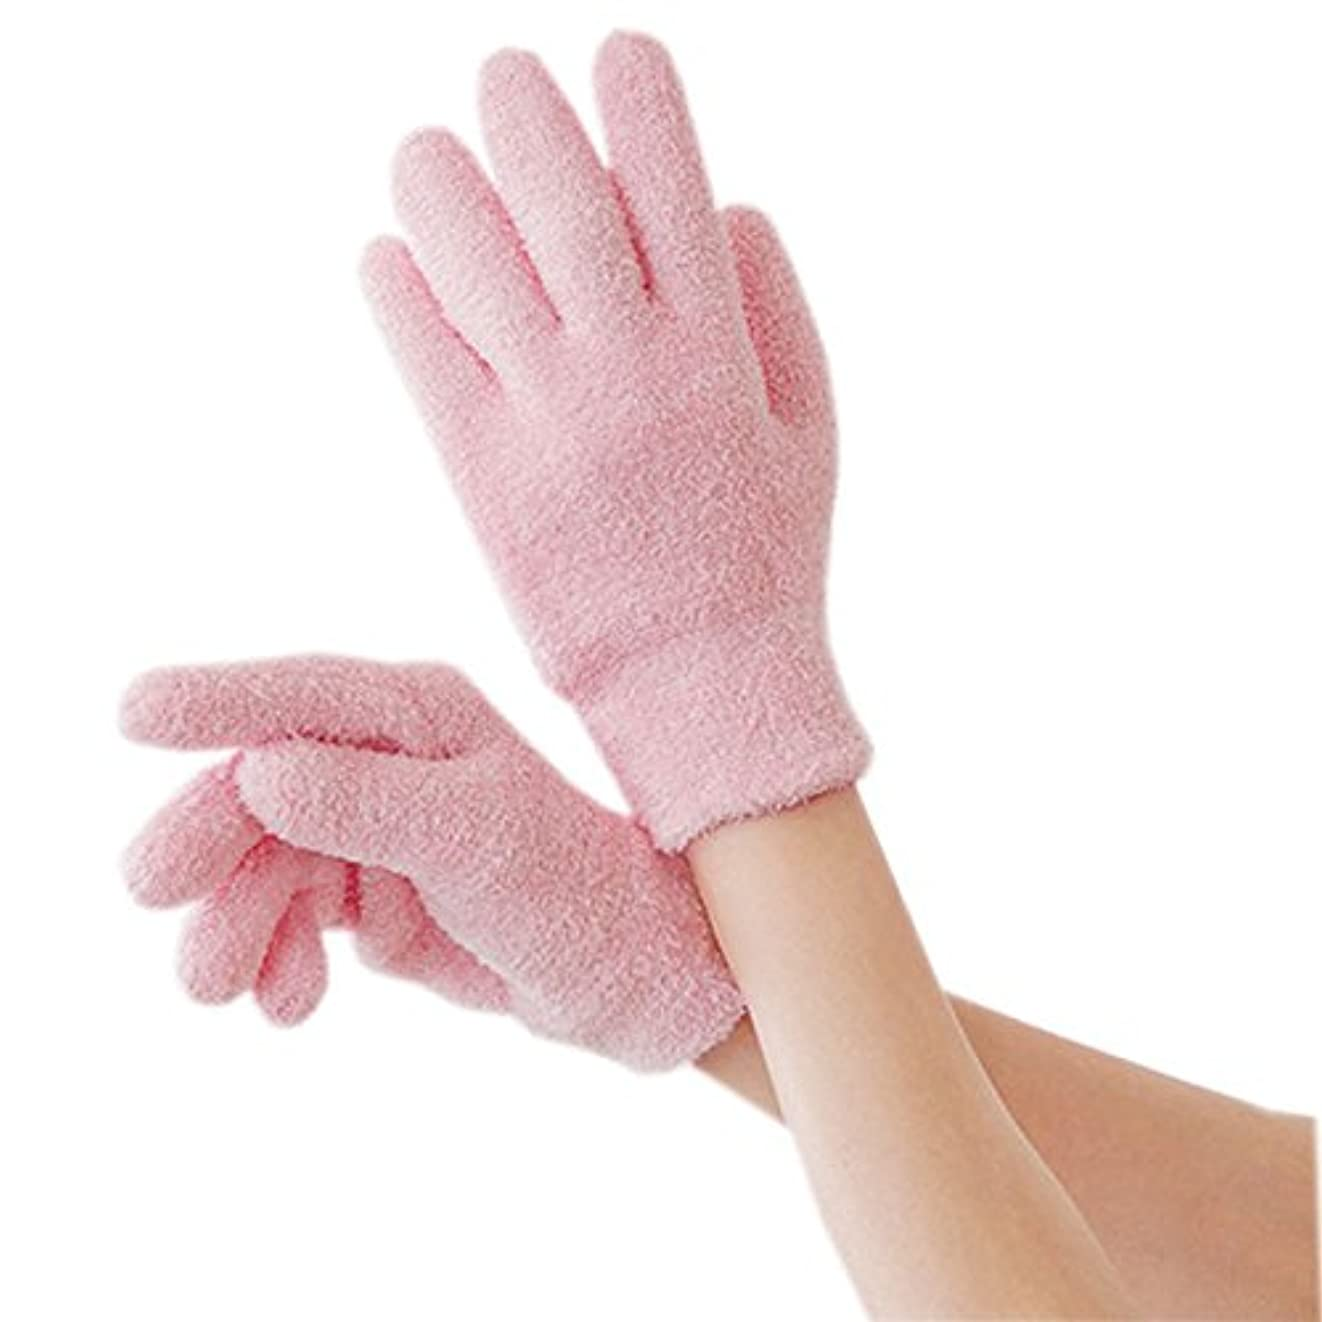 ECHO TOUCH エコタッチ 保湿 手袋 靴下 ハンドケア フットケア 手 足 かかと 乾燥 角質 手荒れ 肌荒れ (ゲル?グローブ?ピンク)